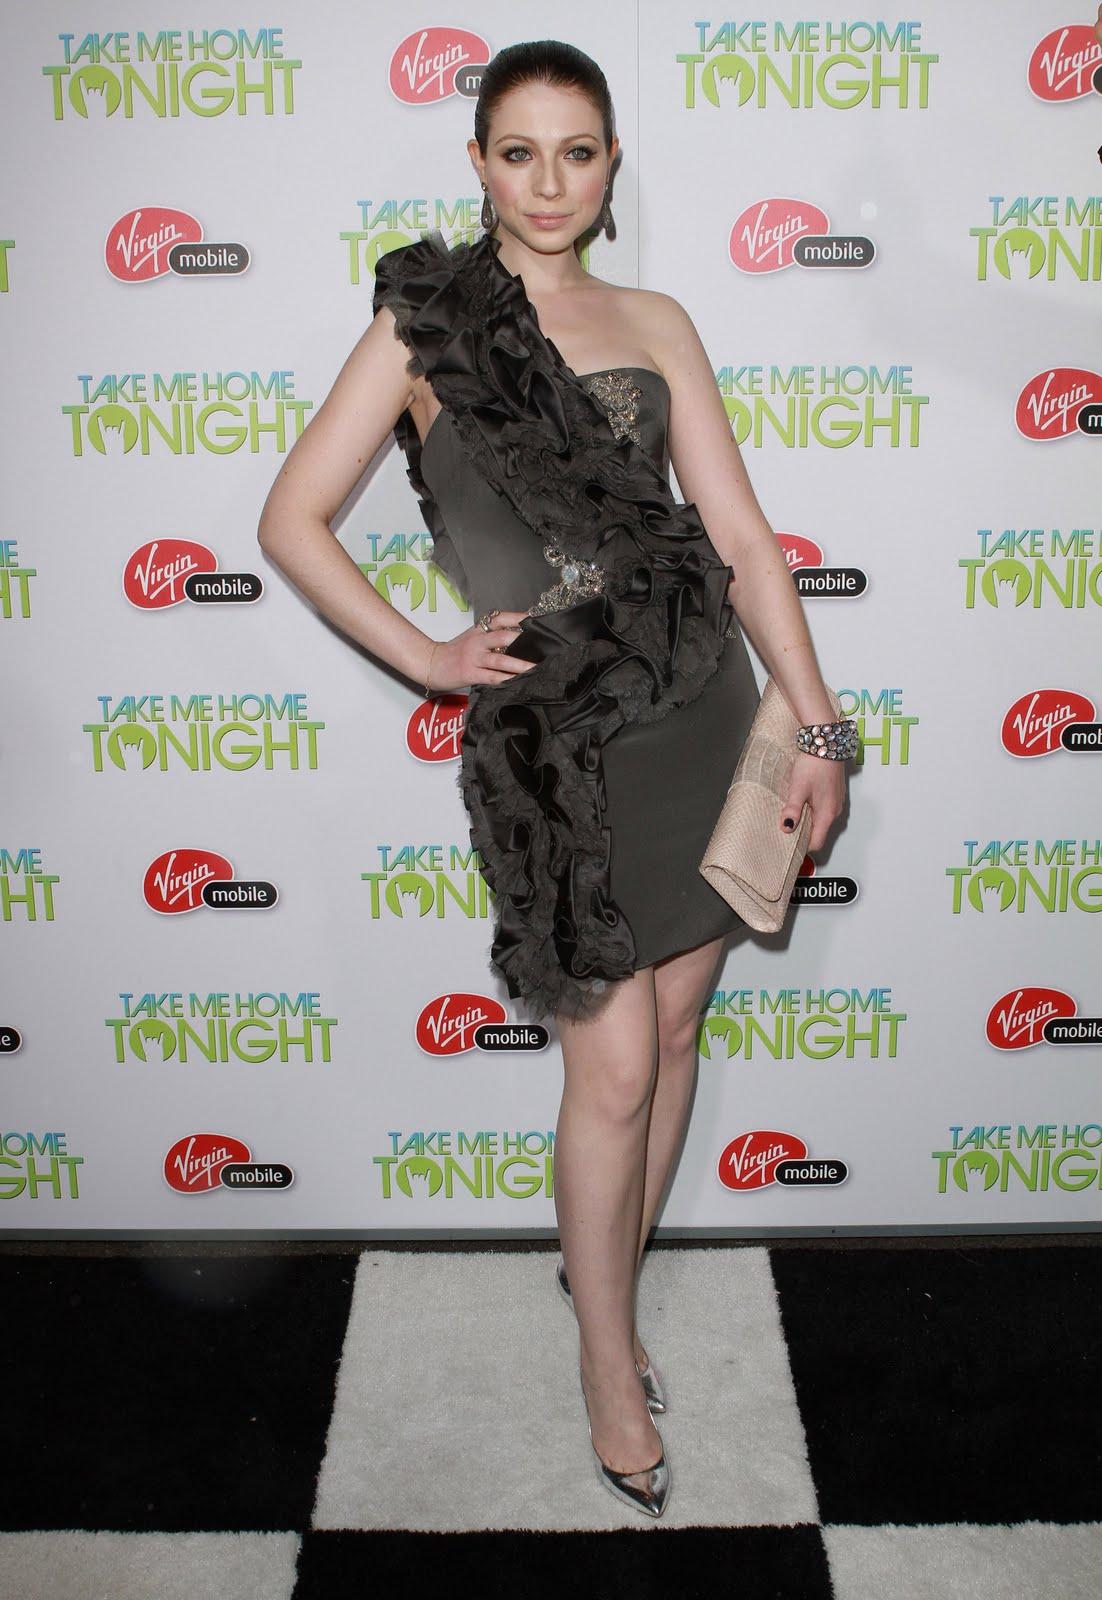 http://4.bp.blogspot.com/-xoIBEmLLSxI/TbnpX4KNgZI/AAAAAAAAHfU/FLLsh26akTw/s1600/Michelle_Trachtenberg_Take_Me_Home_Tonight_Premiere_J0001_031.jpg